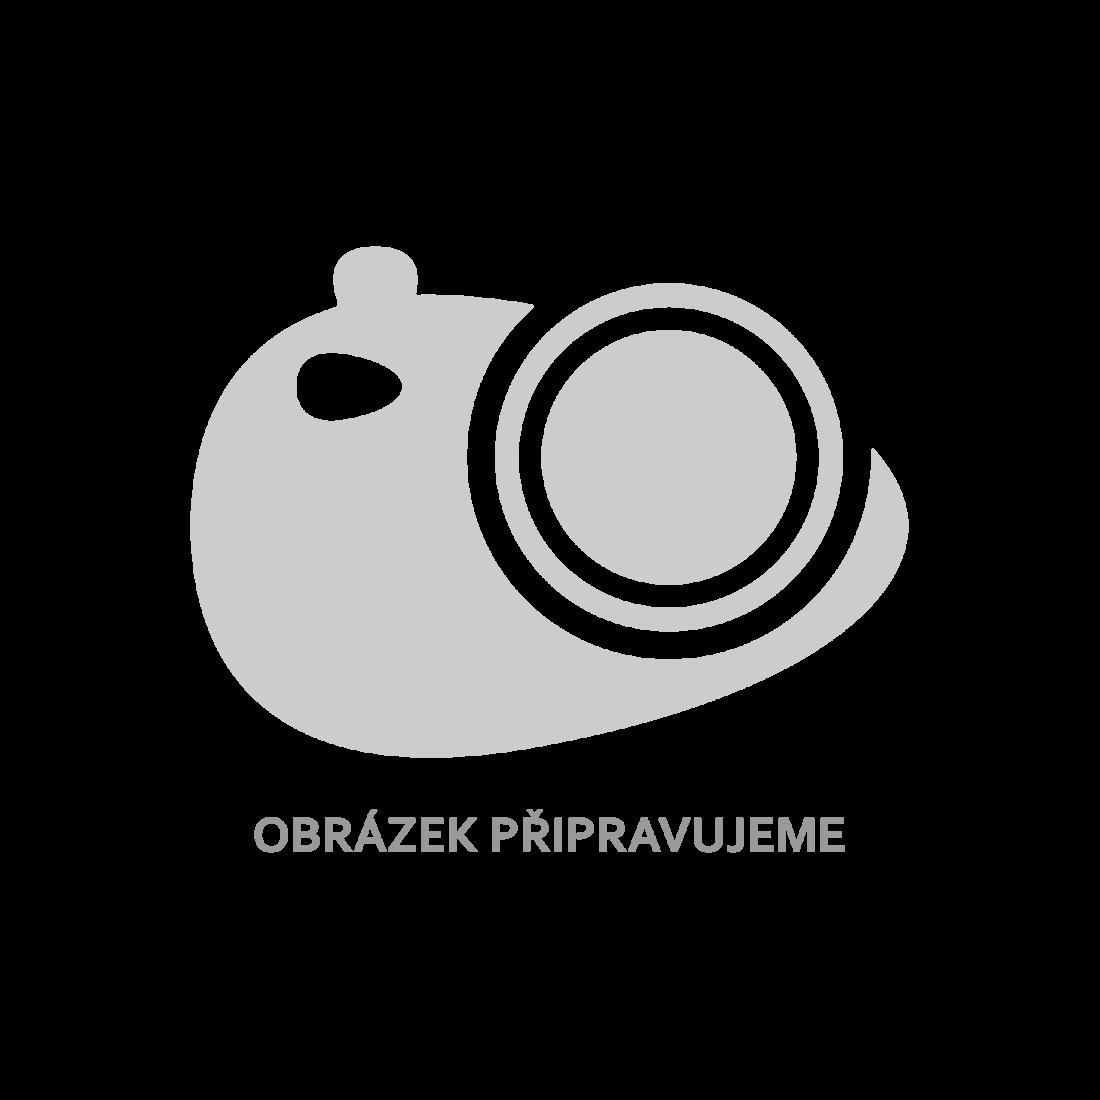 vidaXL Prosklená skříň šedá 82,5 x 30,5 x 115 cm dřevotříska [802752]